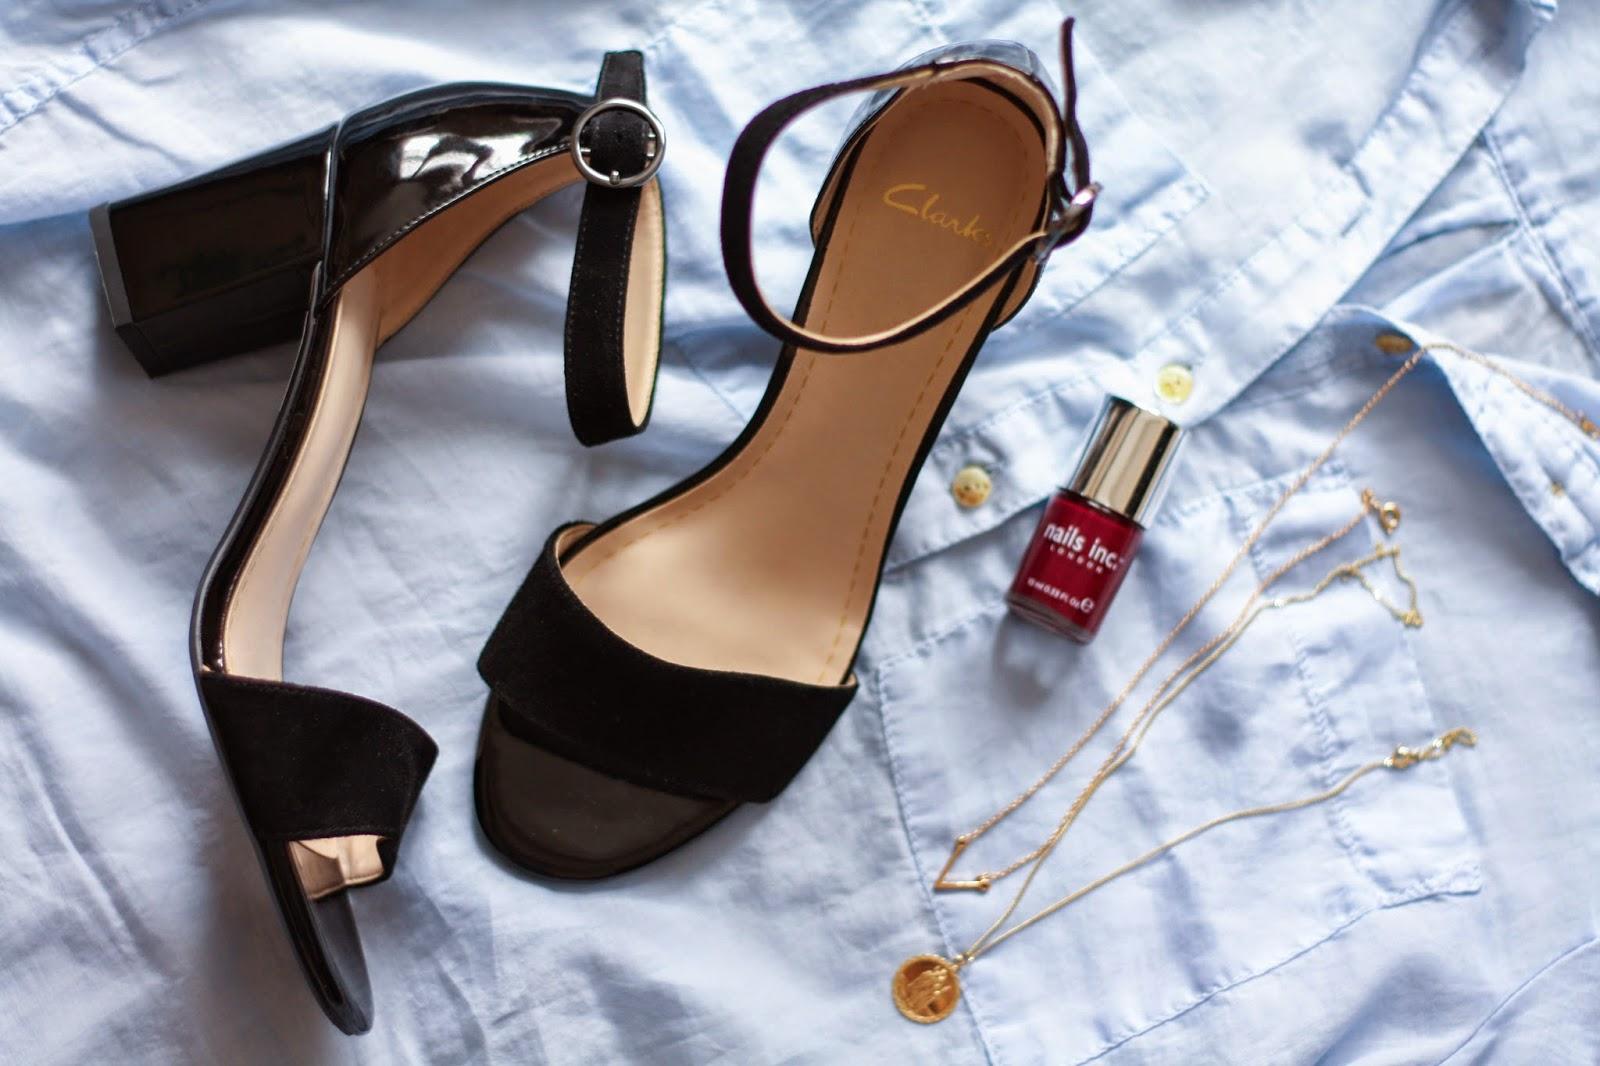 c585ada8611 clarks-strappy-sandals-black-I - Cityscape Bliss